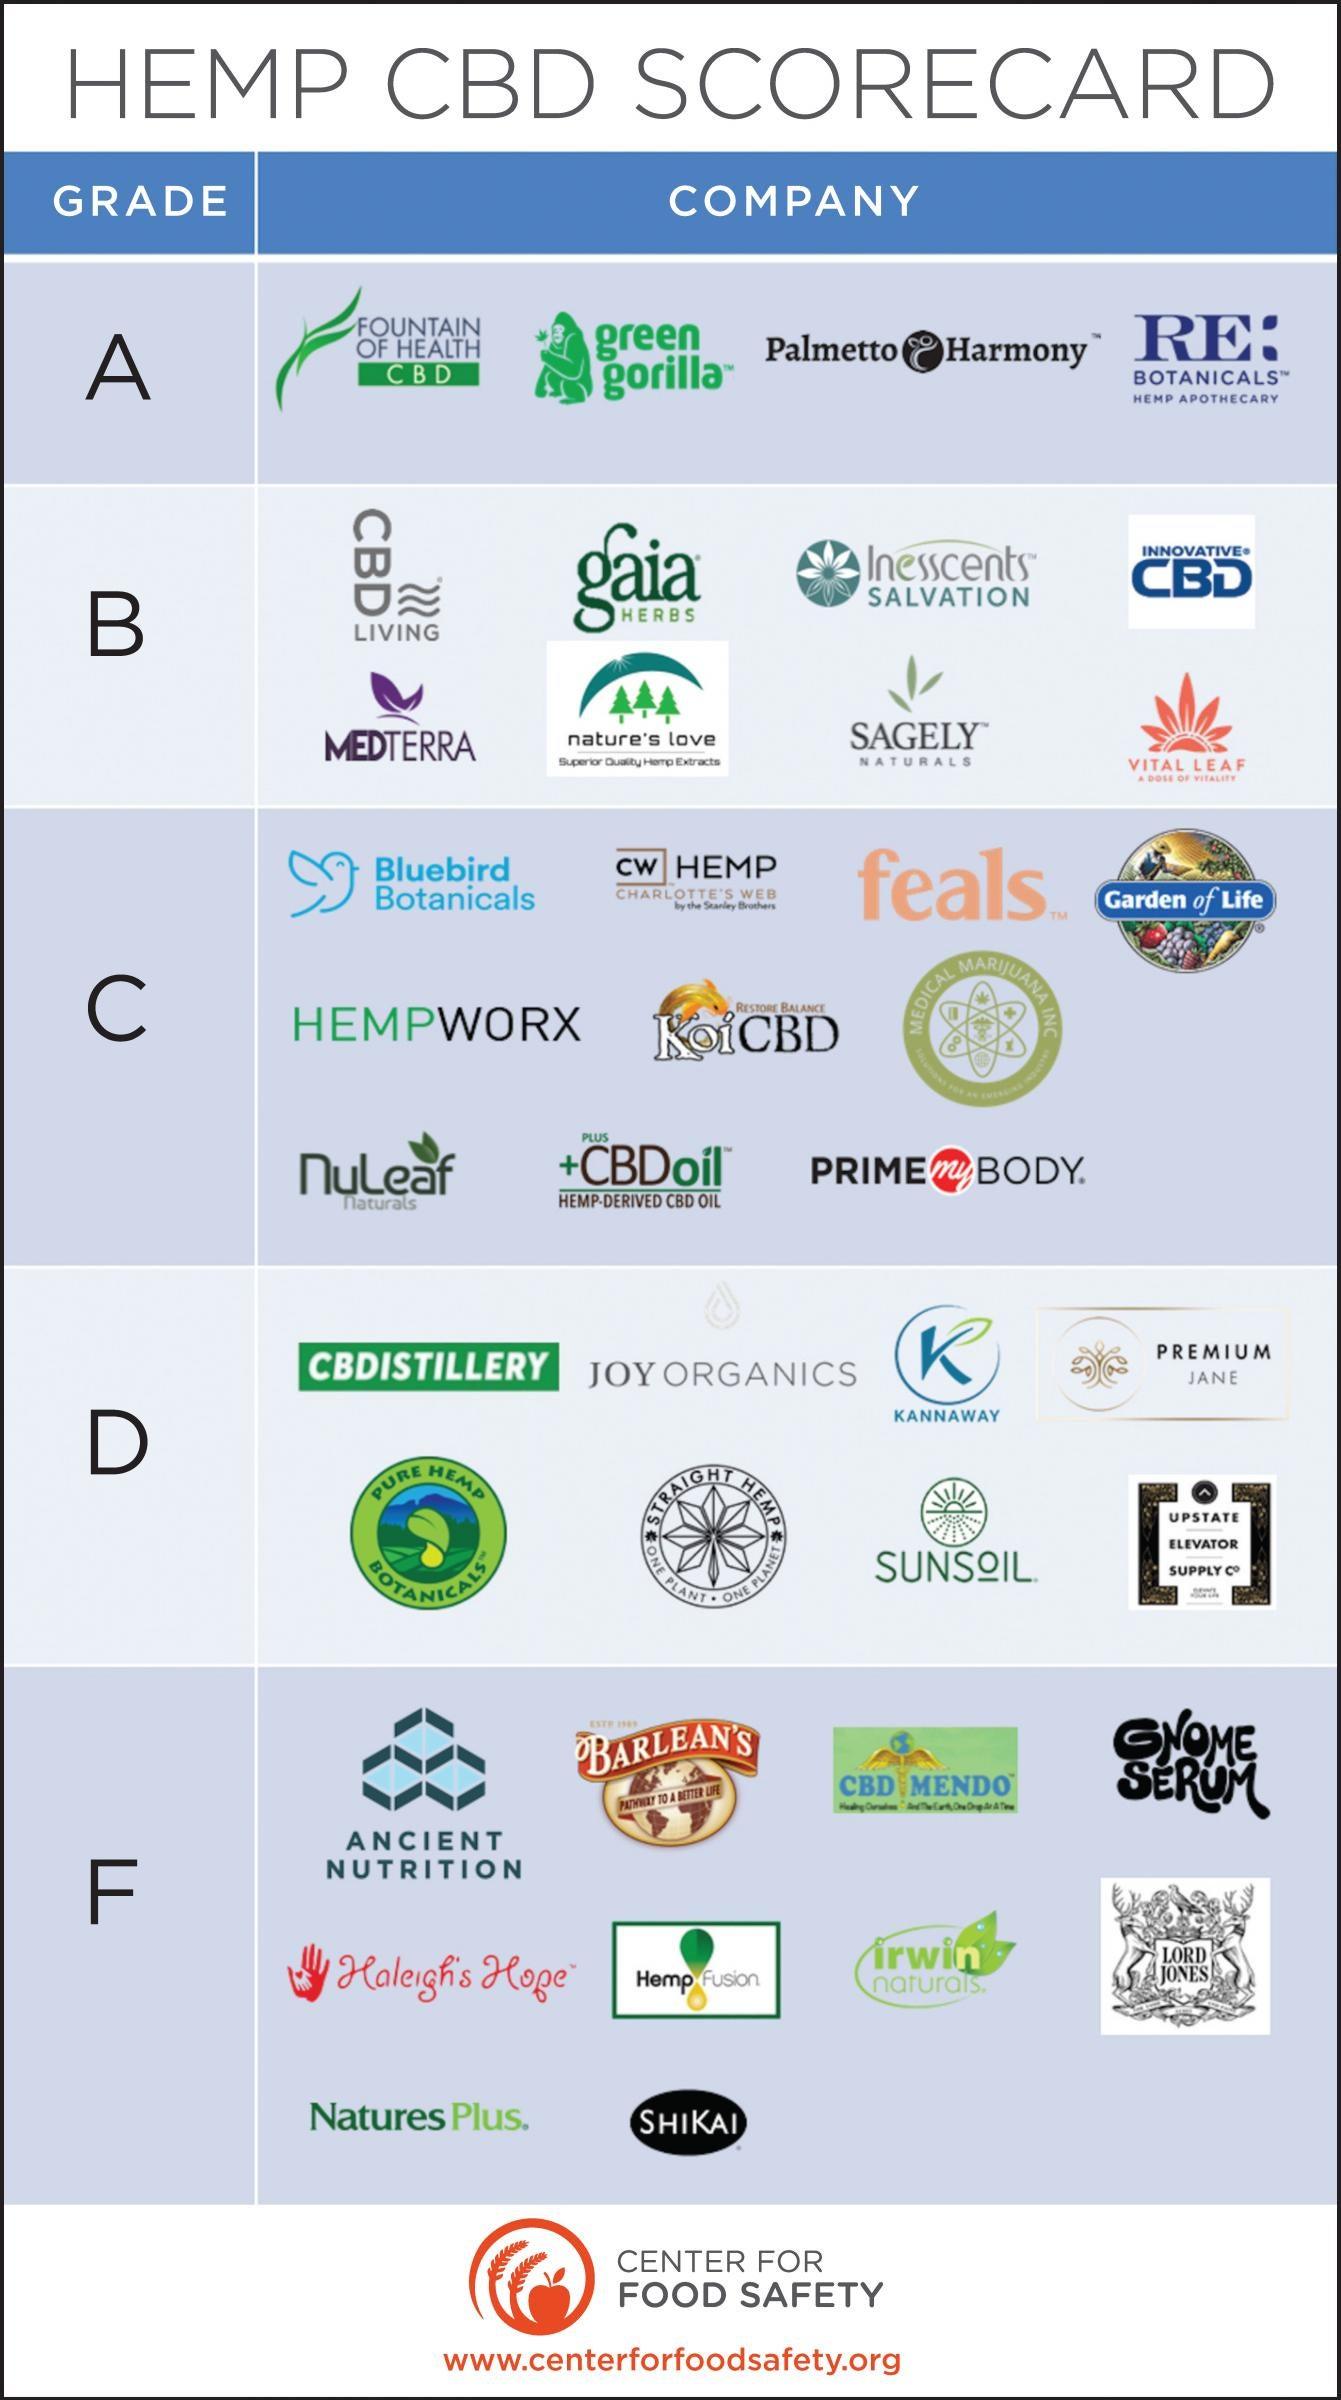 , CBD Scorecard: Center For Food Safety Says Only 4 Companies Rate An 'A', Styding CBD, Styding CBD